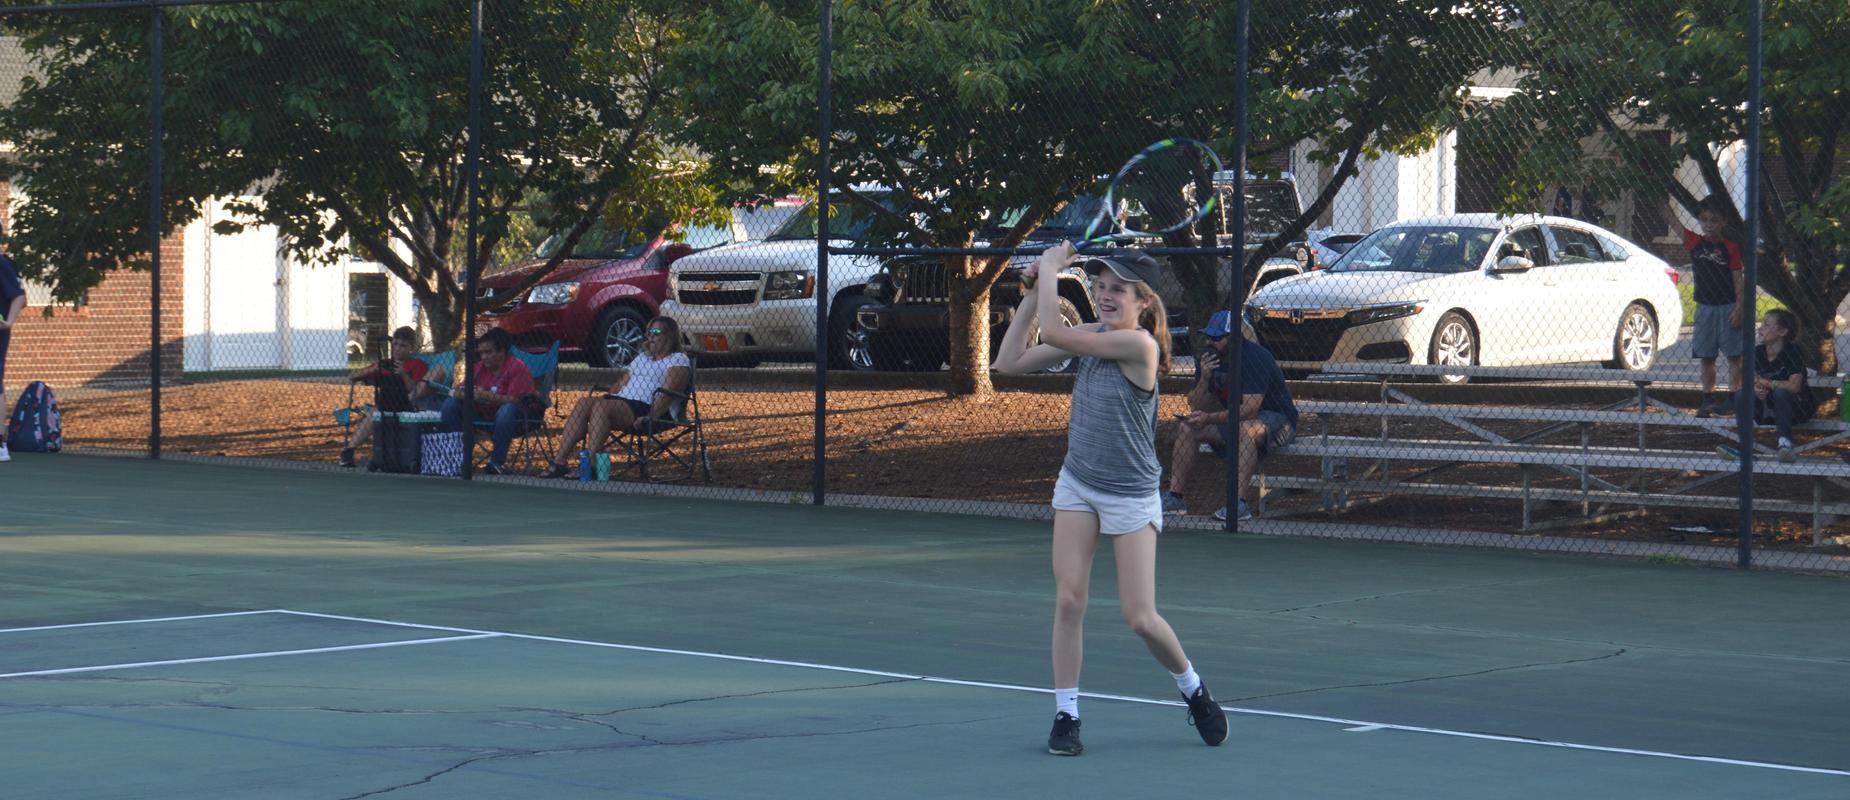 OMS Tennis